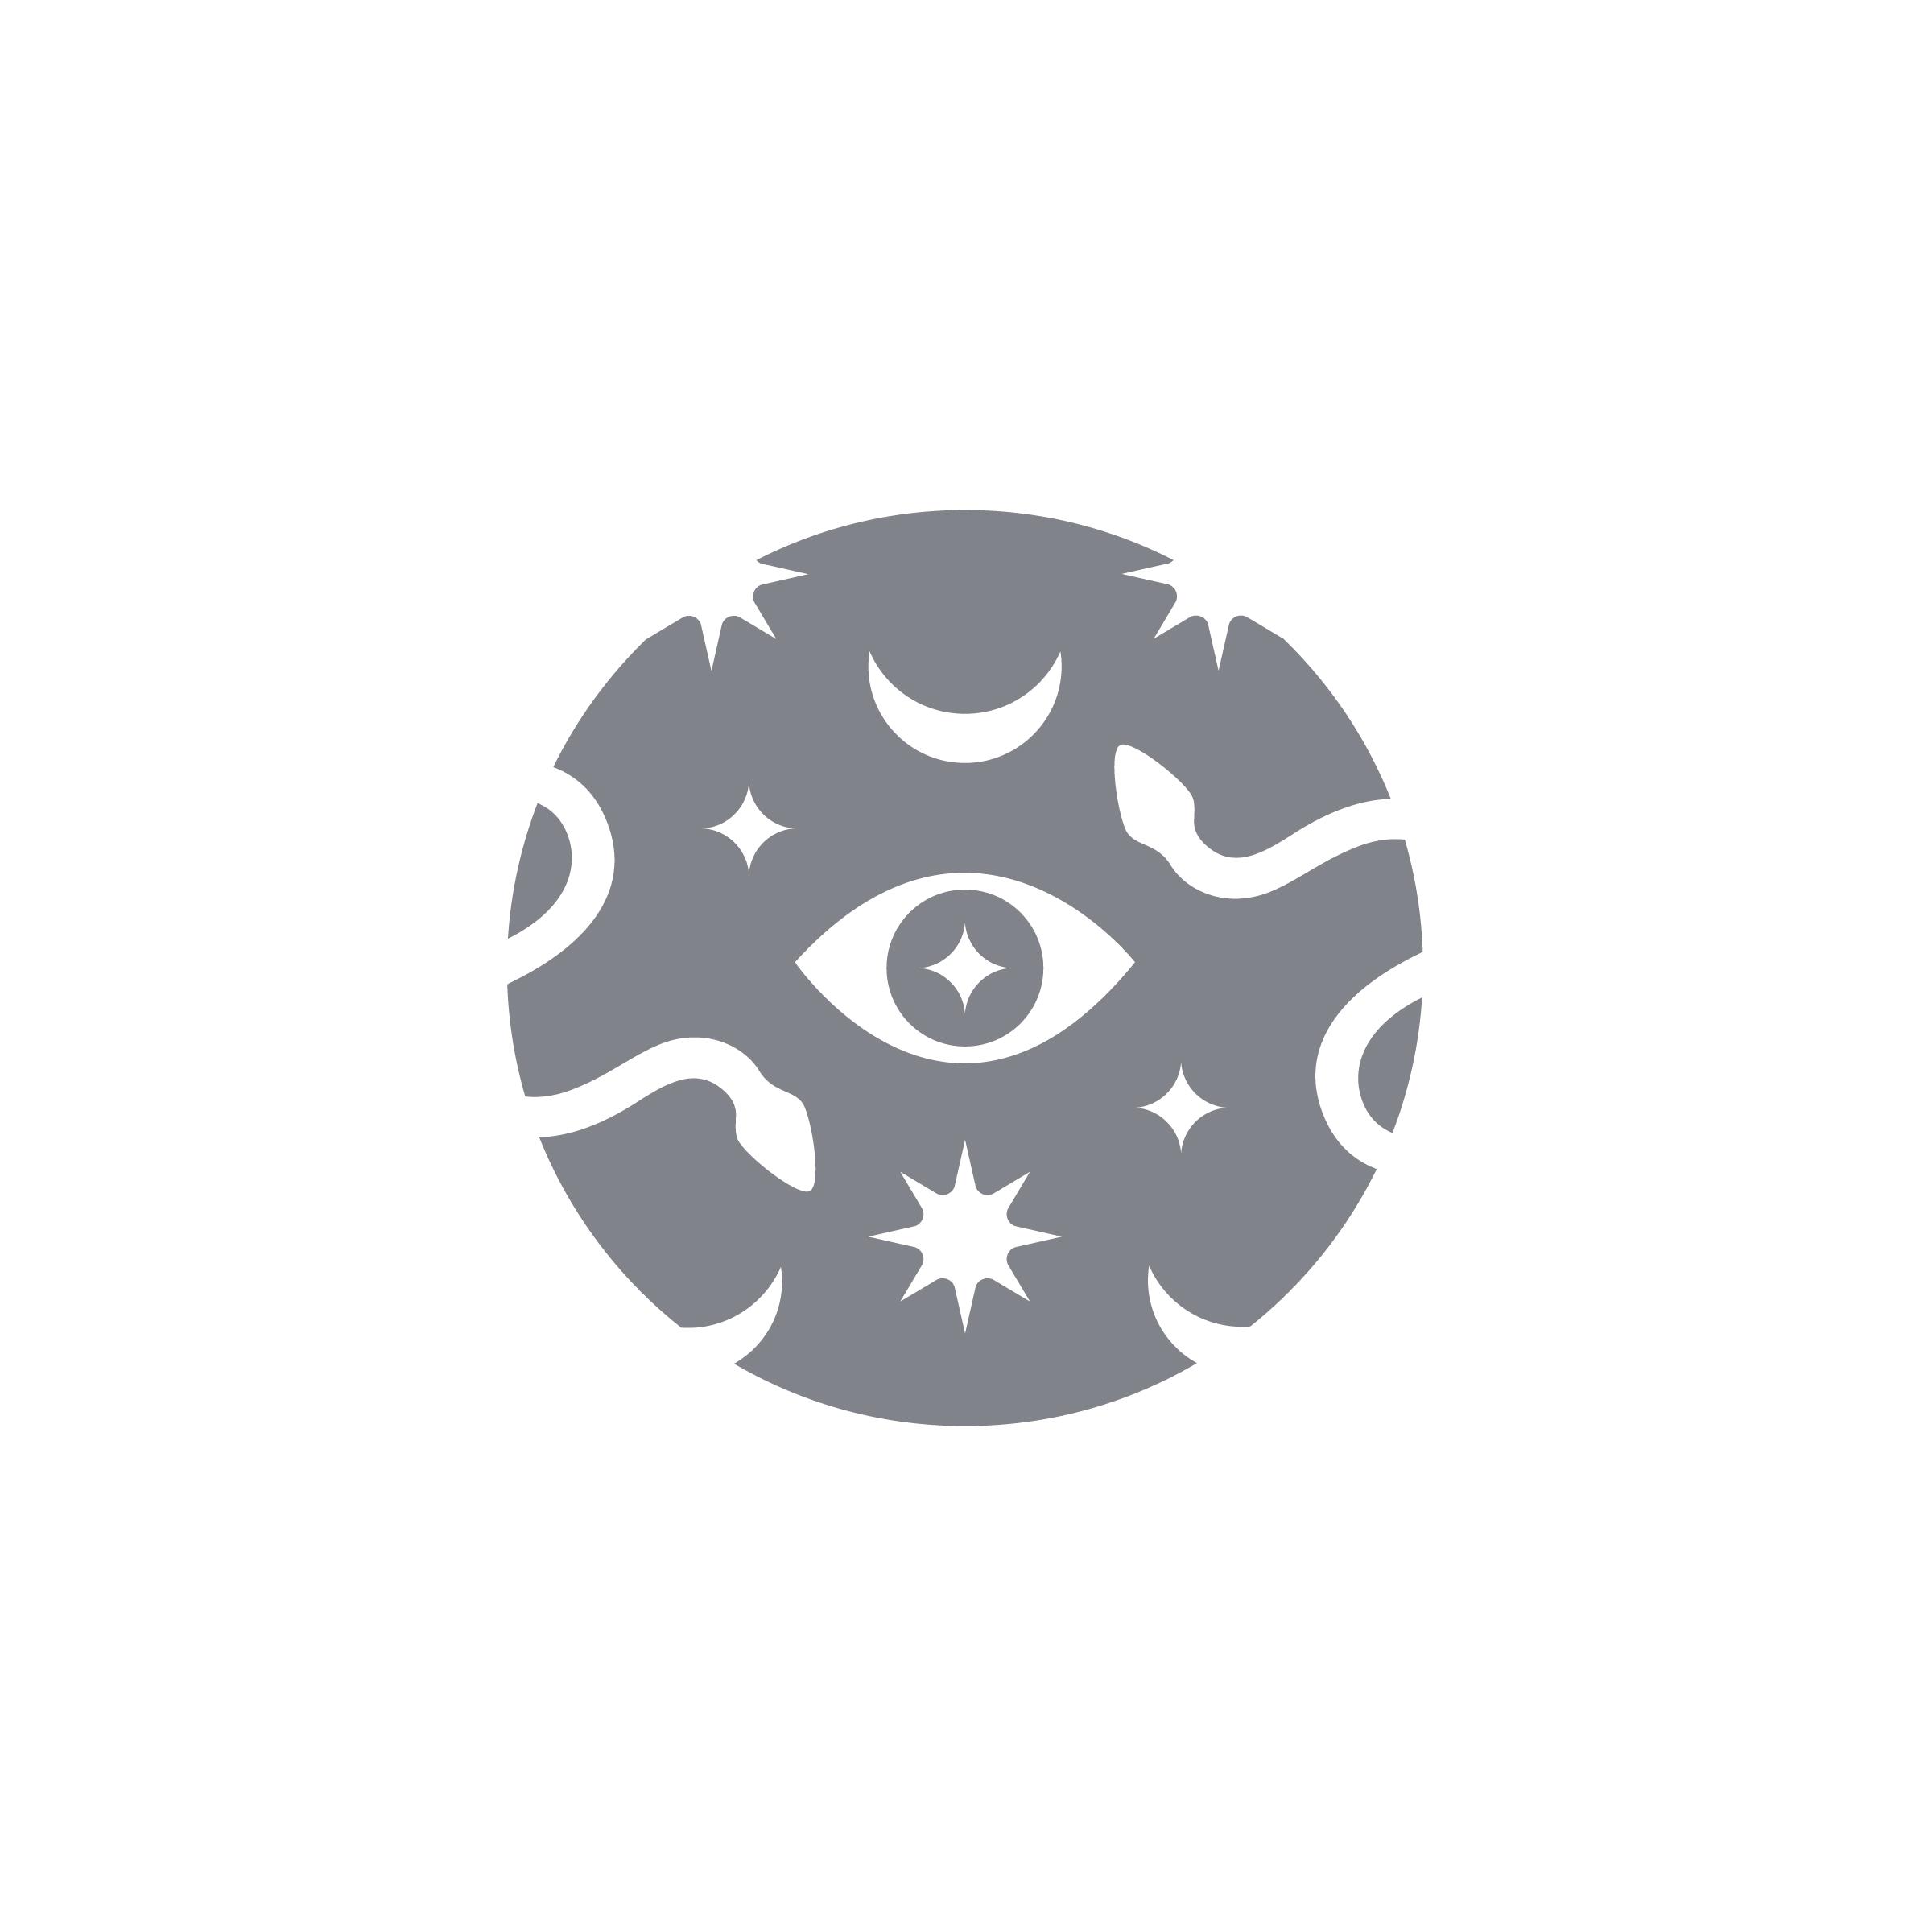 CxrcleIcon-Blueweb-01.jpg